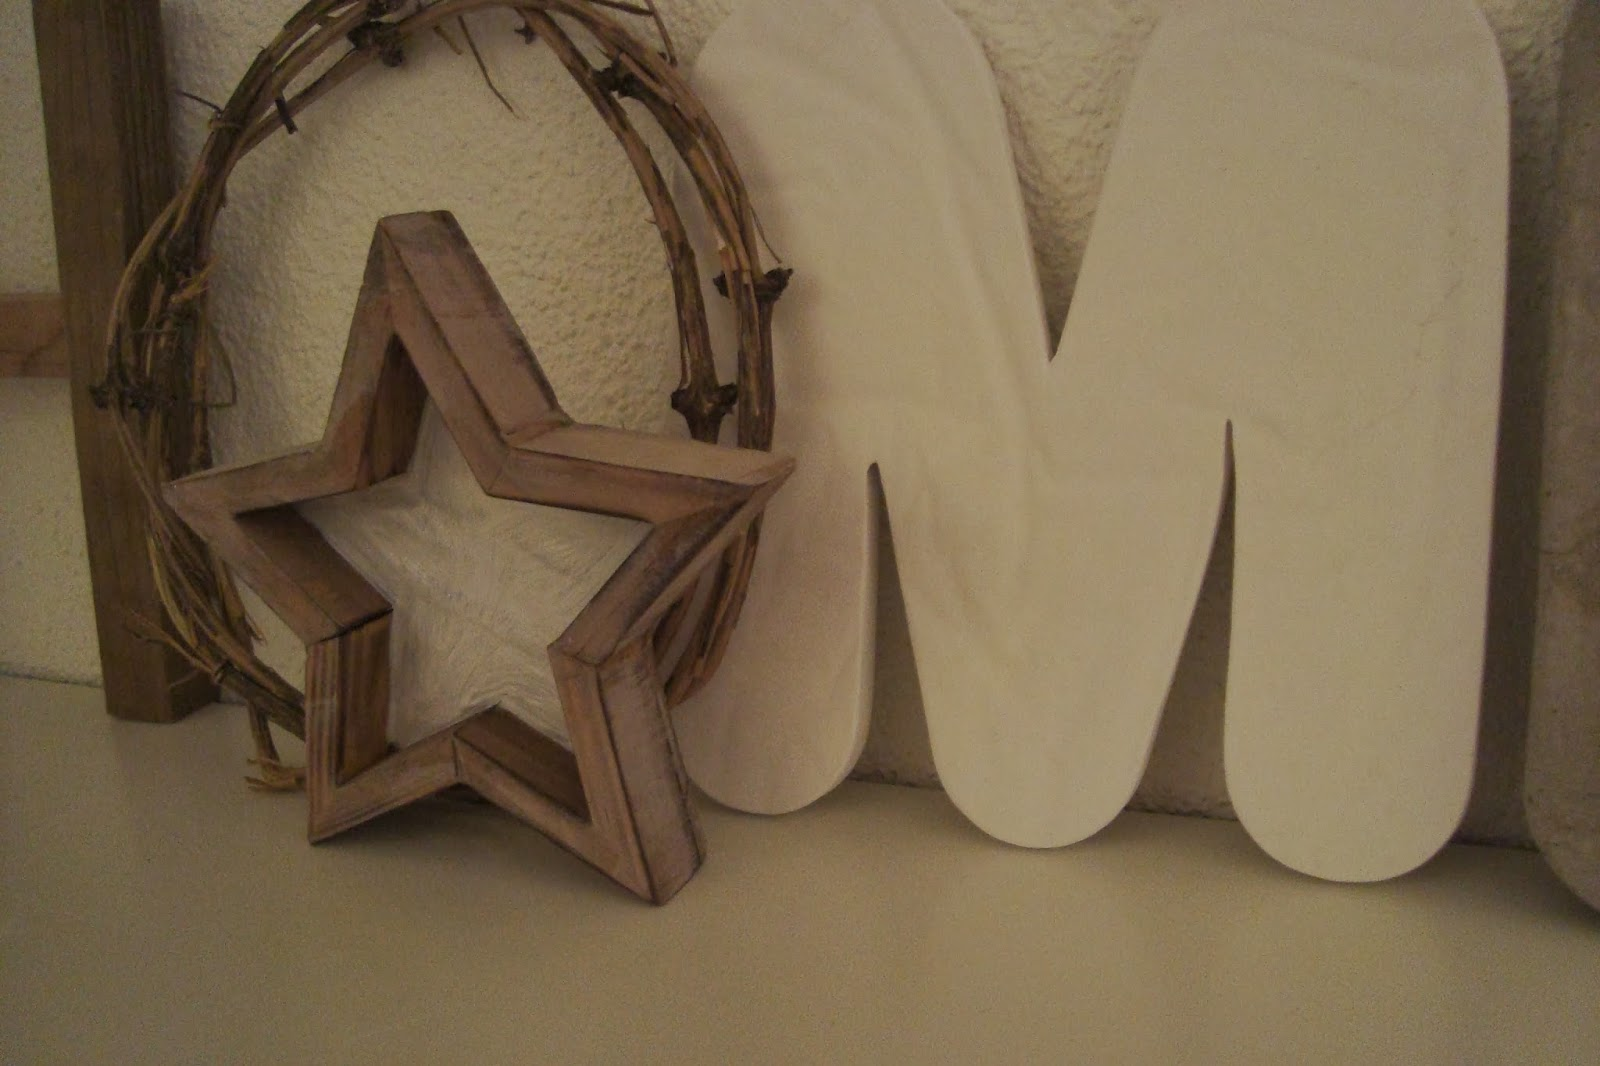 kleefalter 3 t rchen home schriftzug. Black Bedroom Furniture Sets. Home Design Ideas